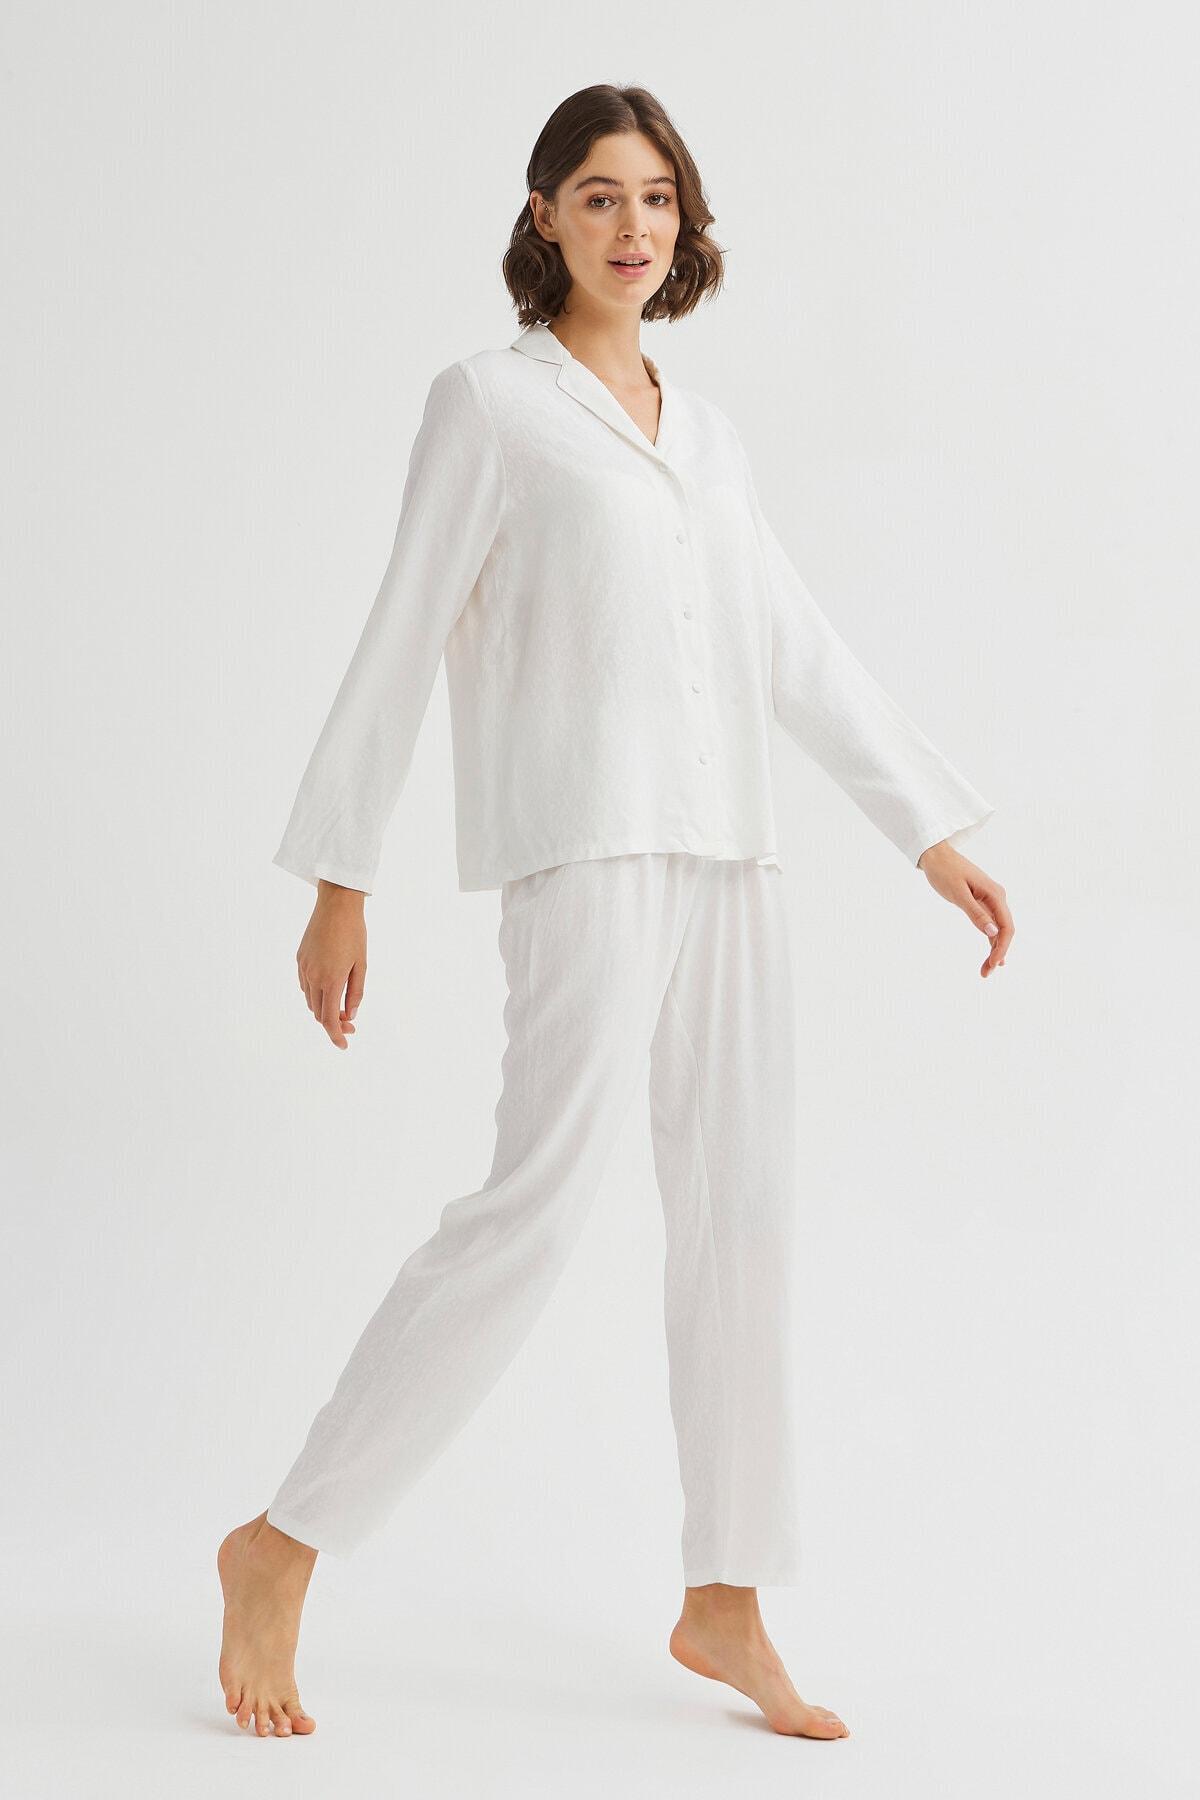 Penti Kar Beyaz Bridal Blanche Pijama Takımı 2